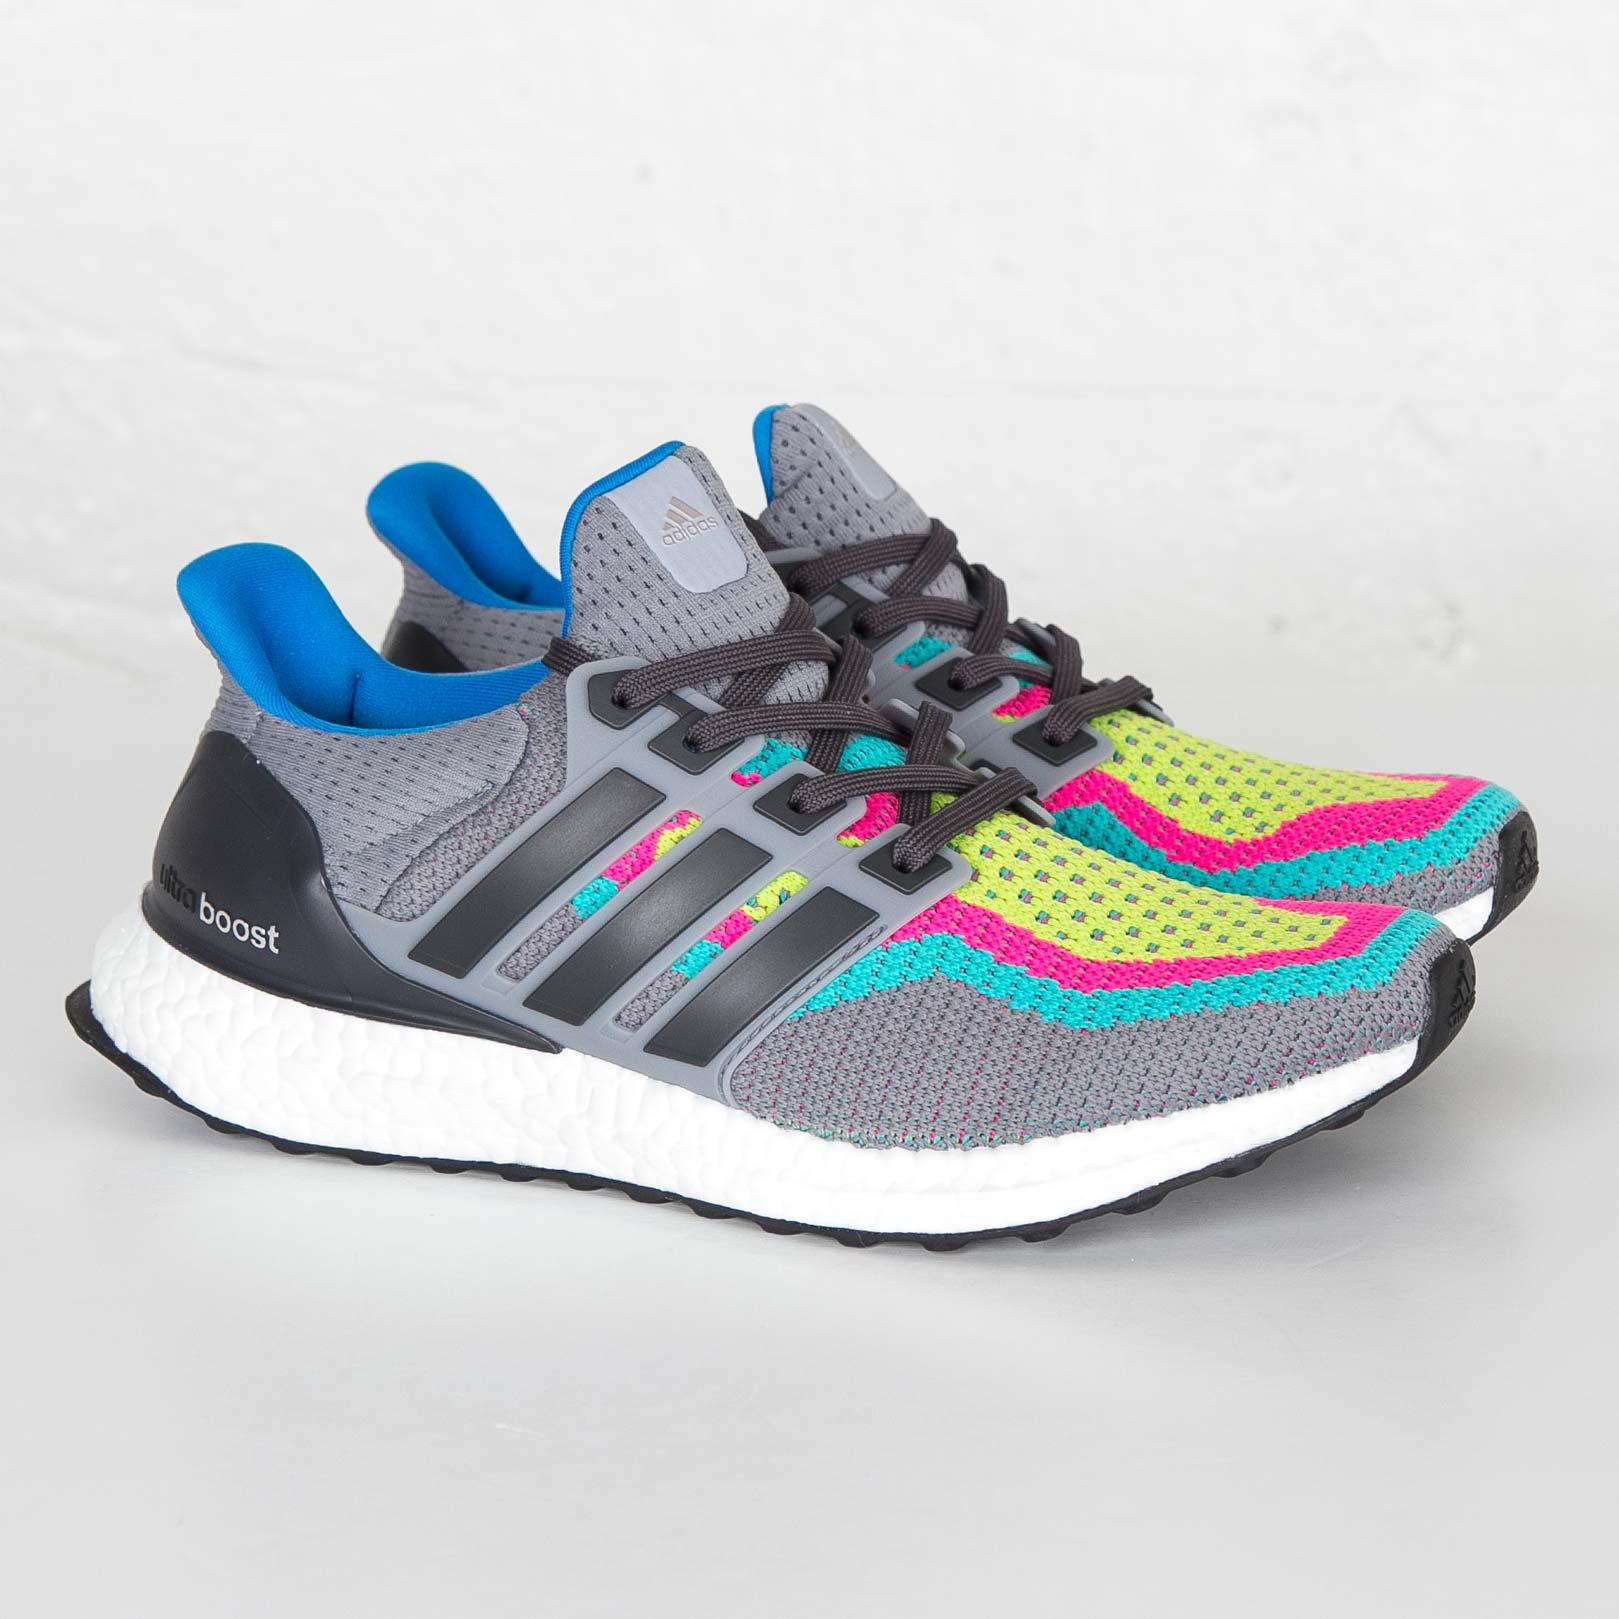 adidas ultra boost m - Aq4003 - SNS   sneakers & streetwear online ...